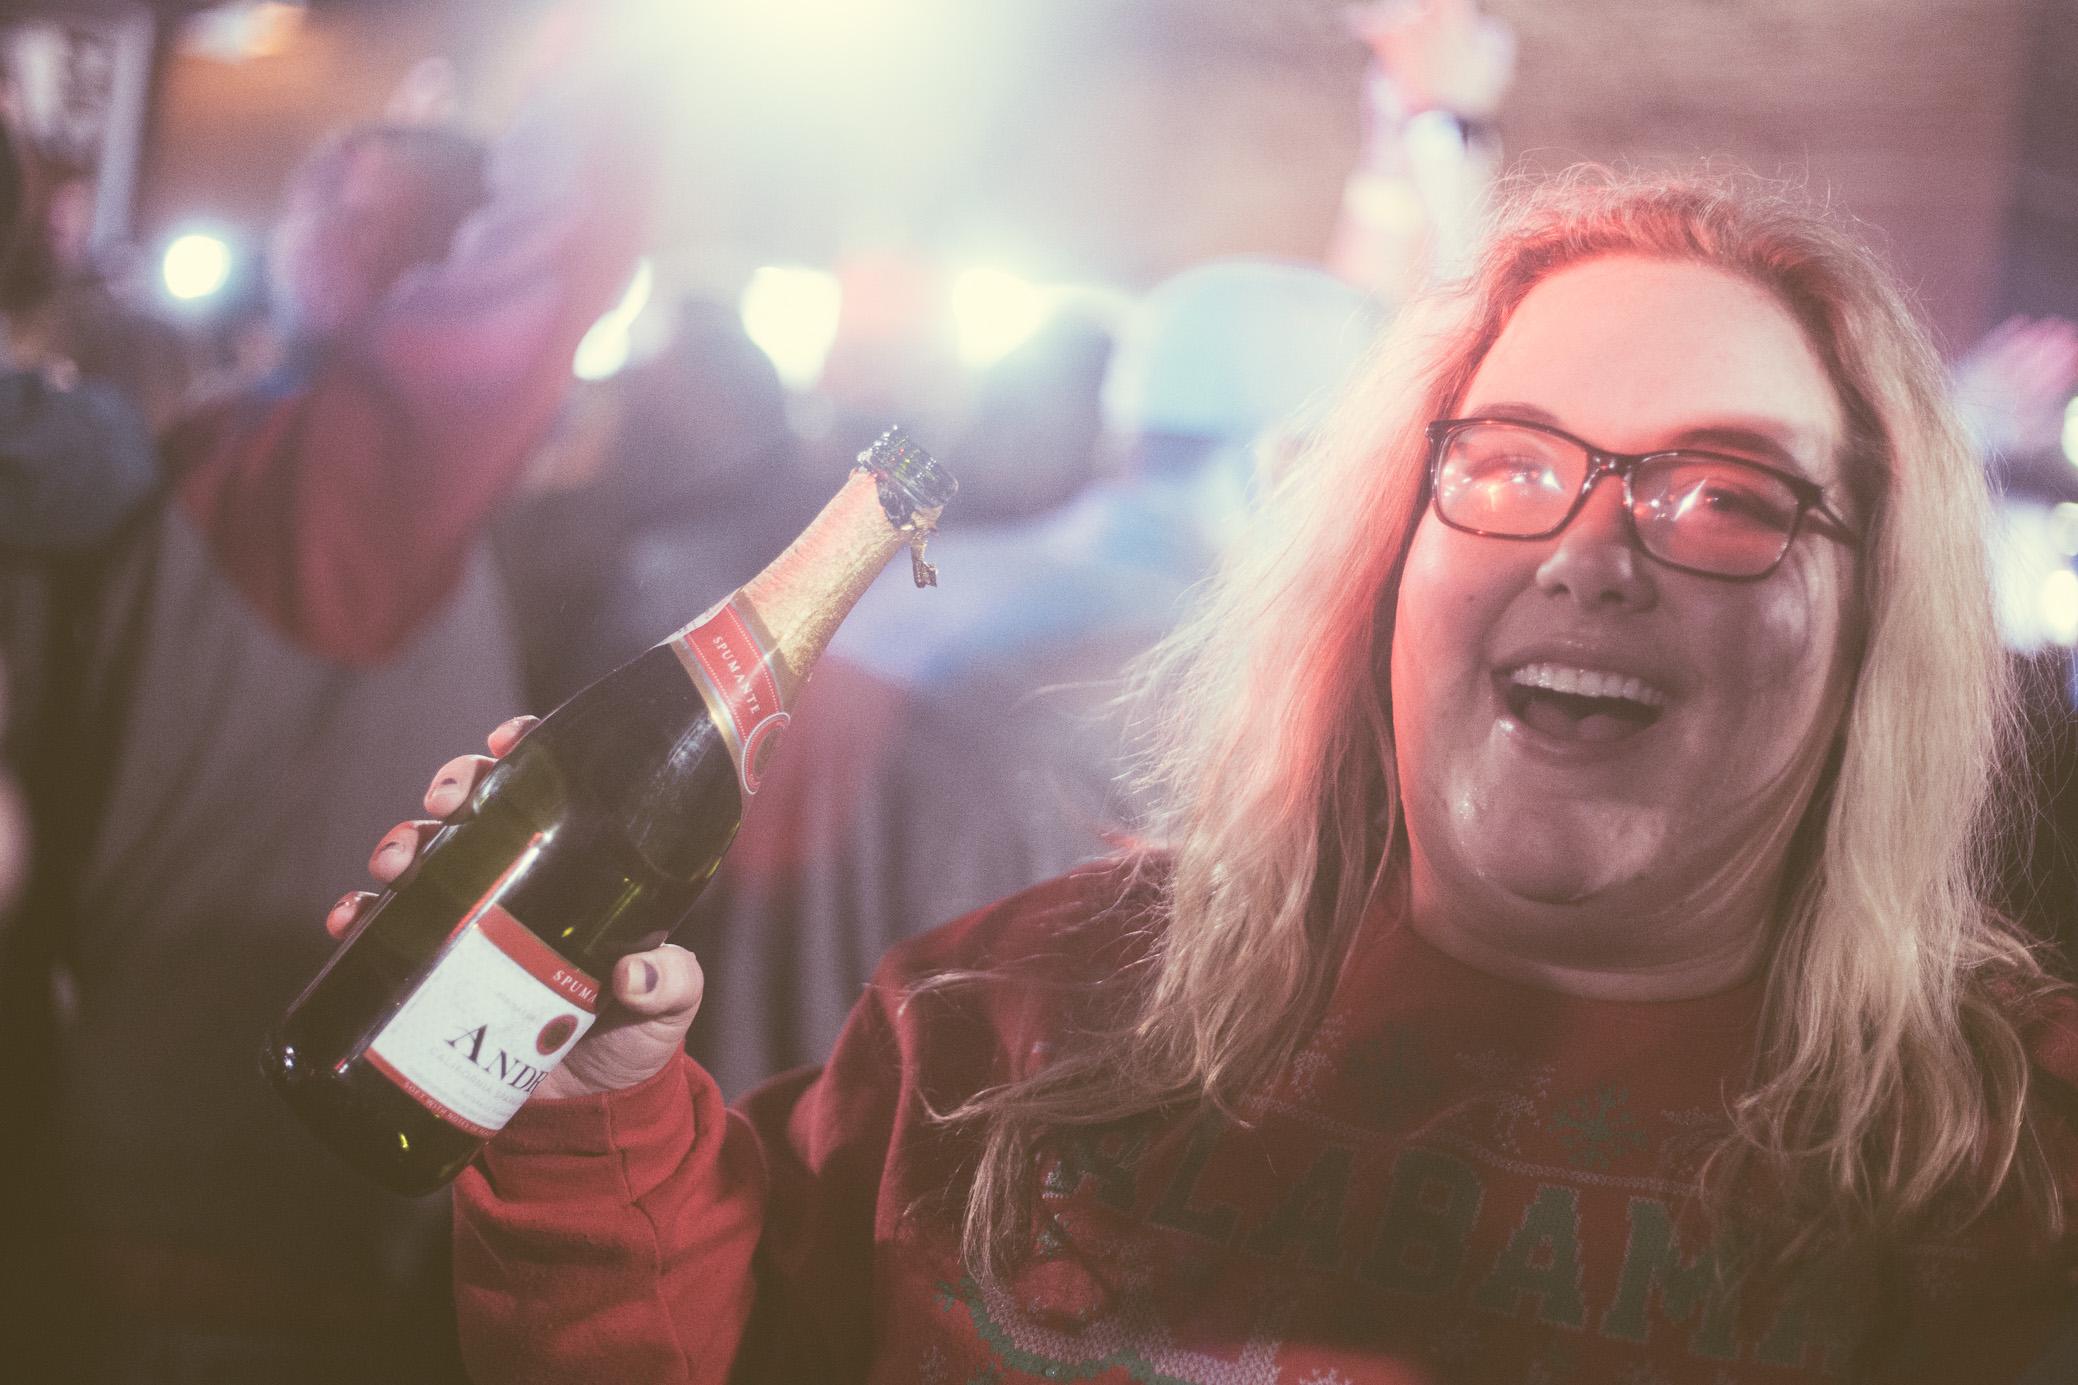 The Strip in Tuscaloosa, Alabama celebrates the University of Alabama's football National Championship win on January 8th, 2018. (Photo by David A. Smith/DSmithScenes)